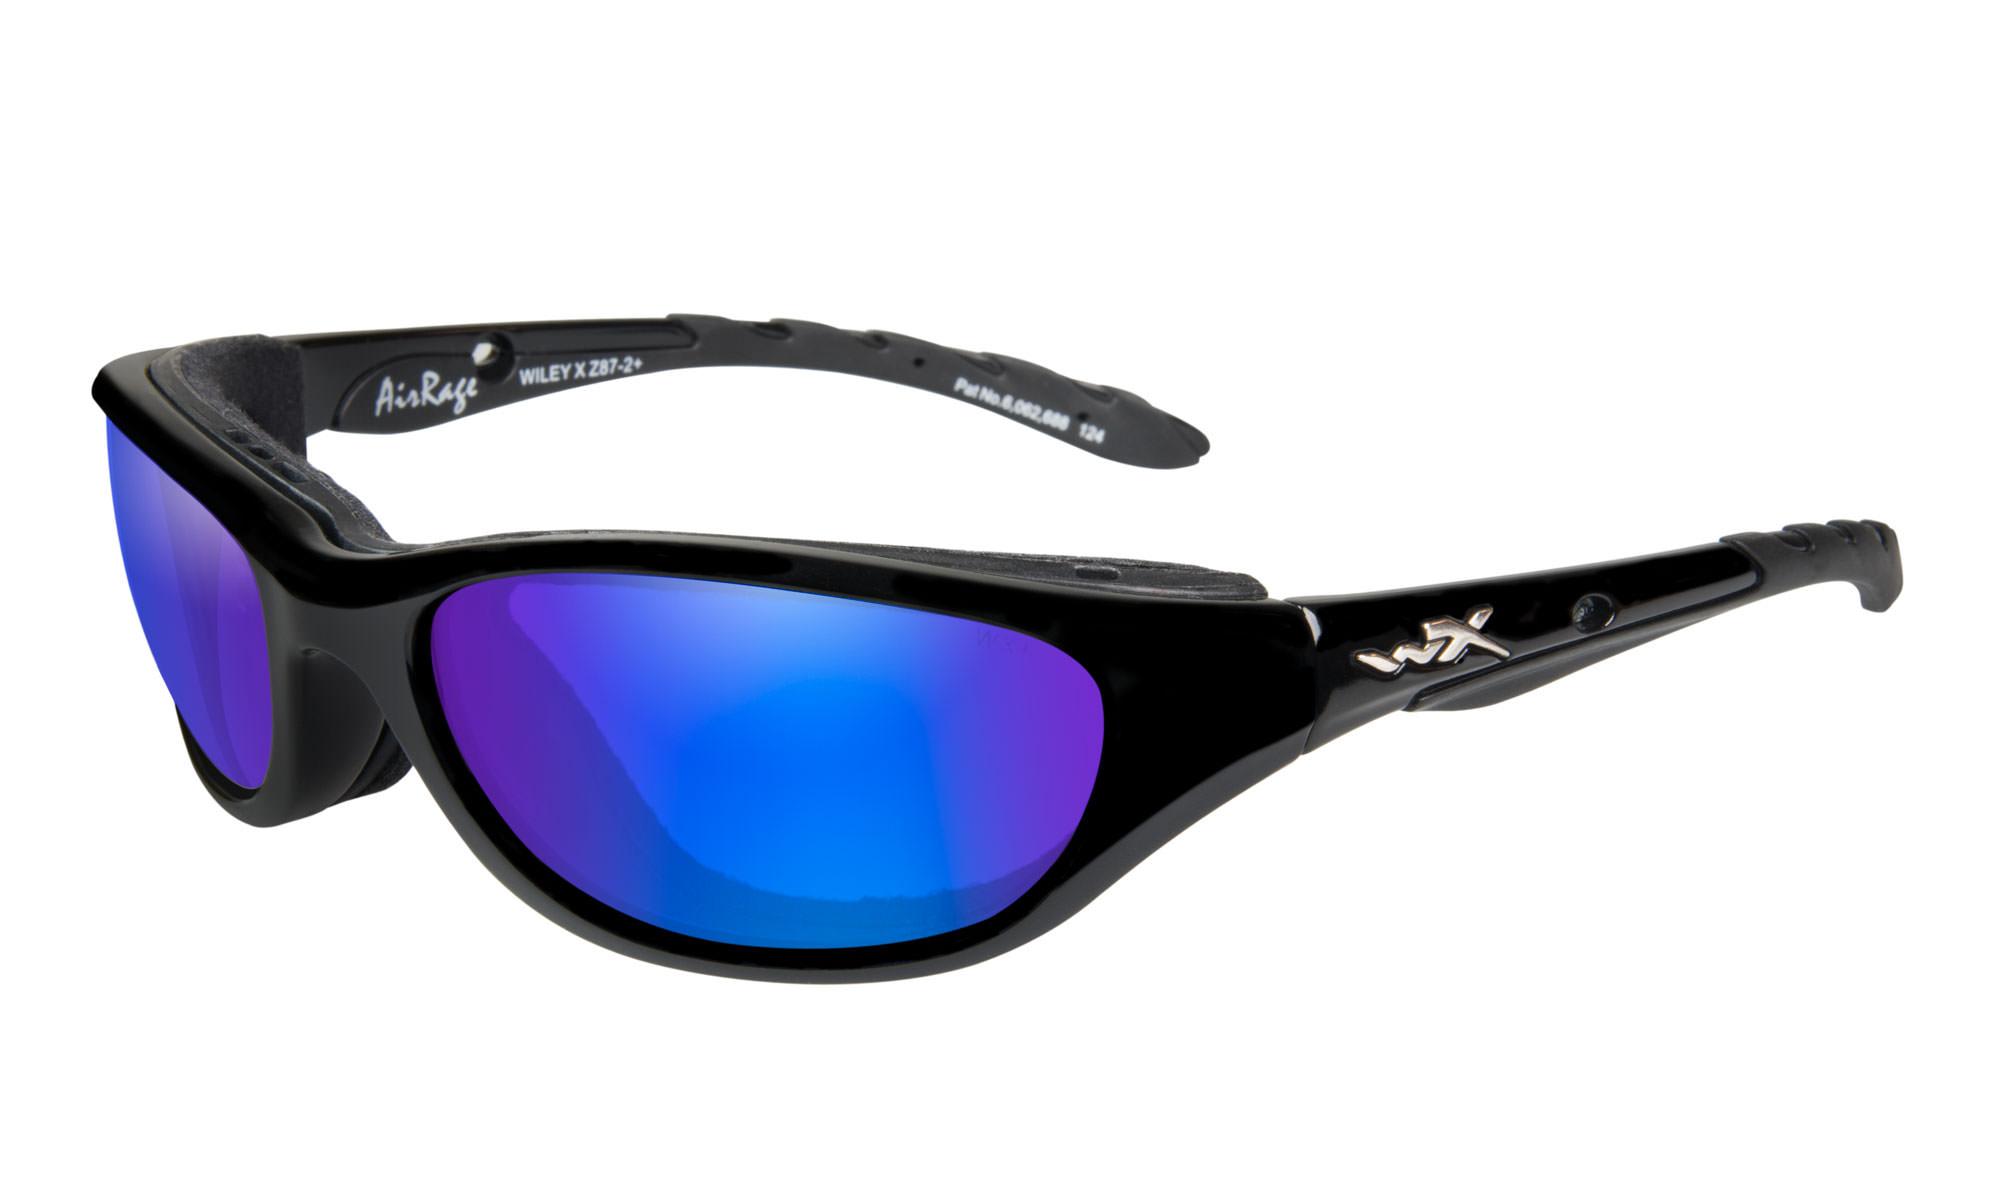 857ac64e52e1 Wiley-X Airrage Gloss Black with Polarized Blue Mirror Lenses